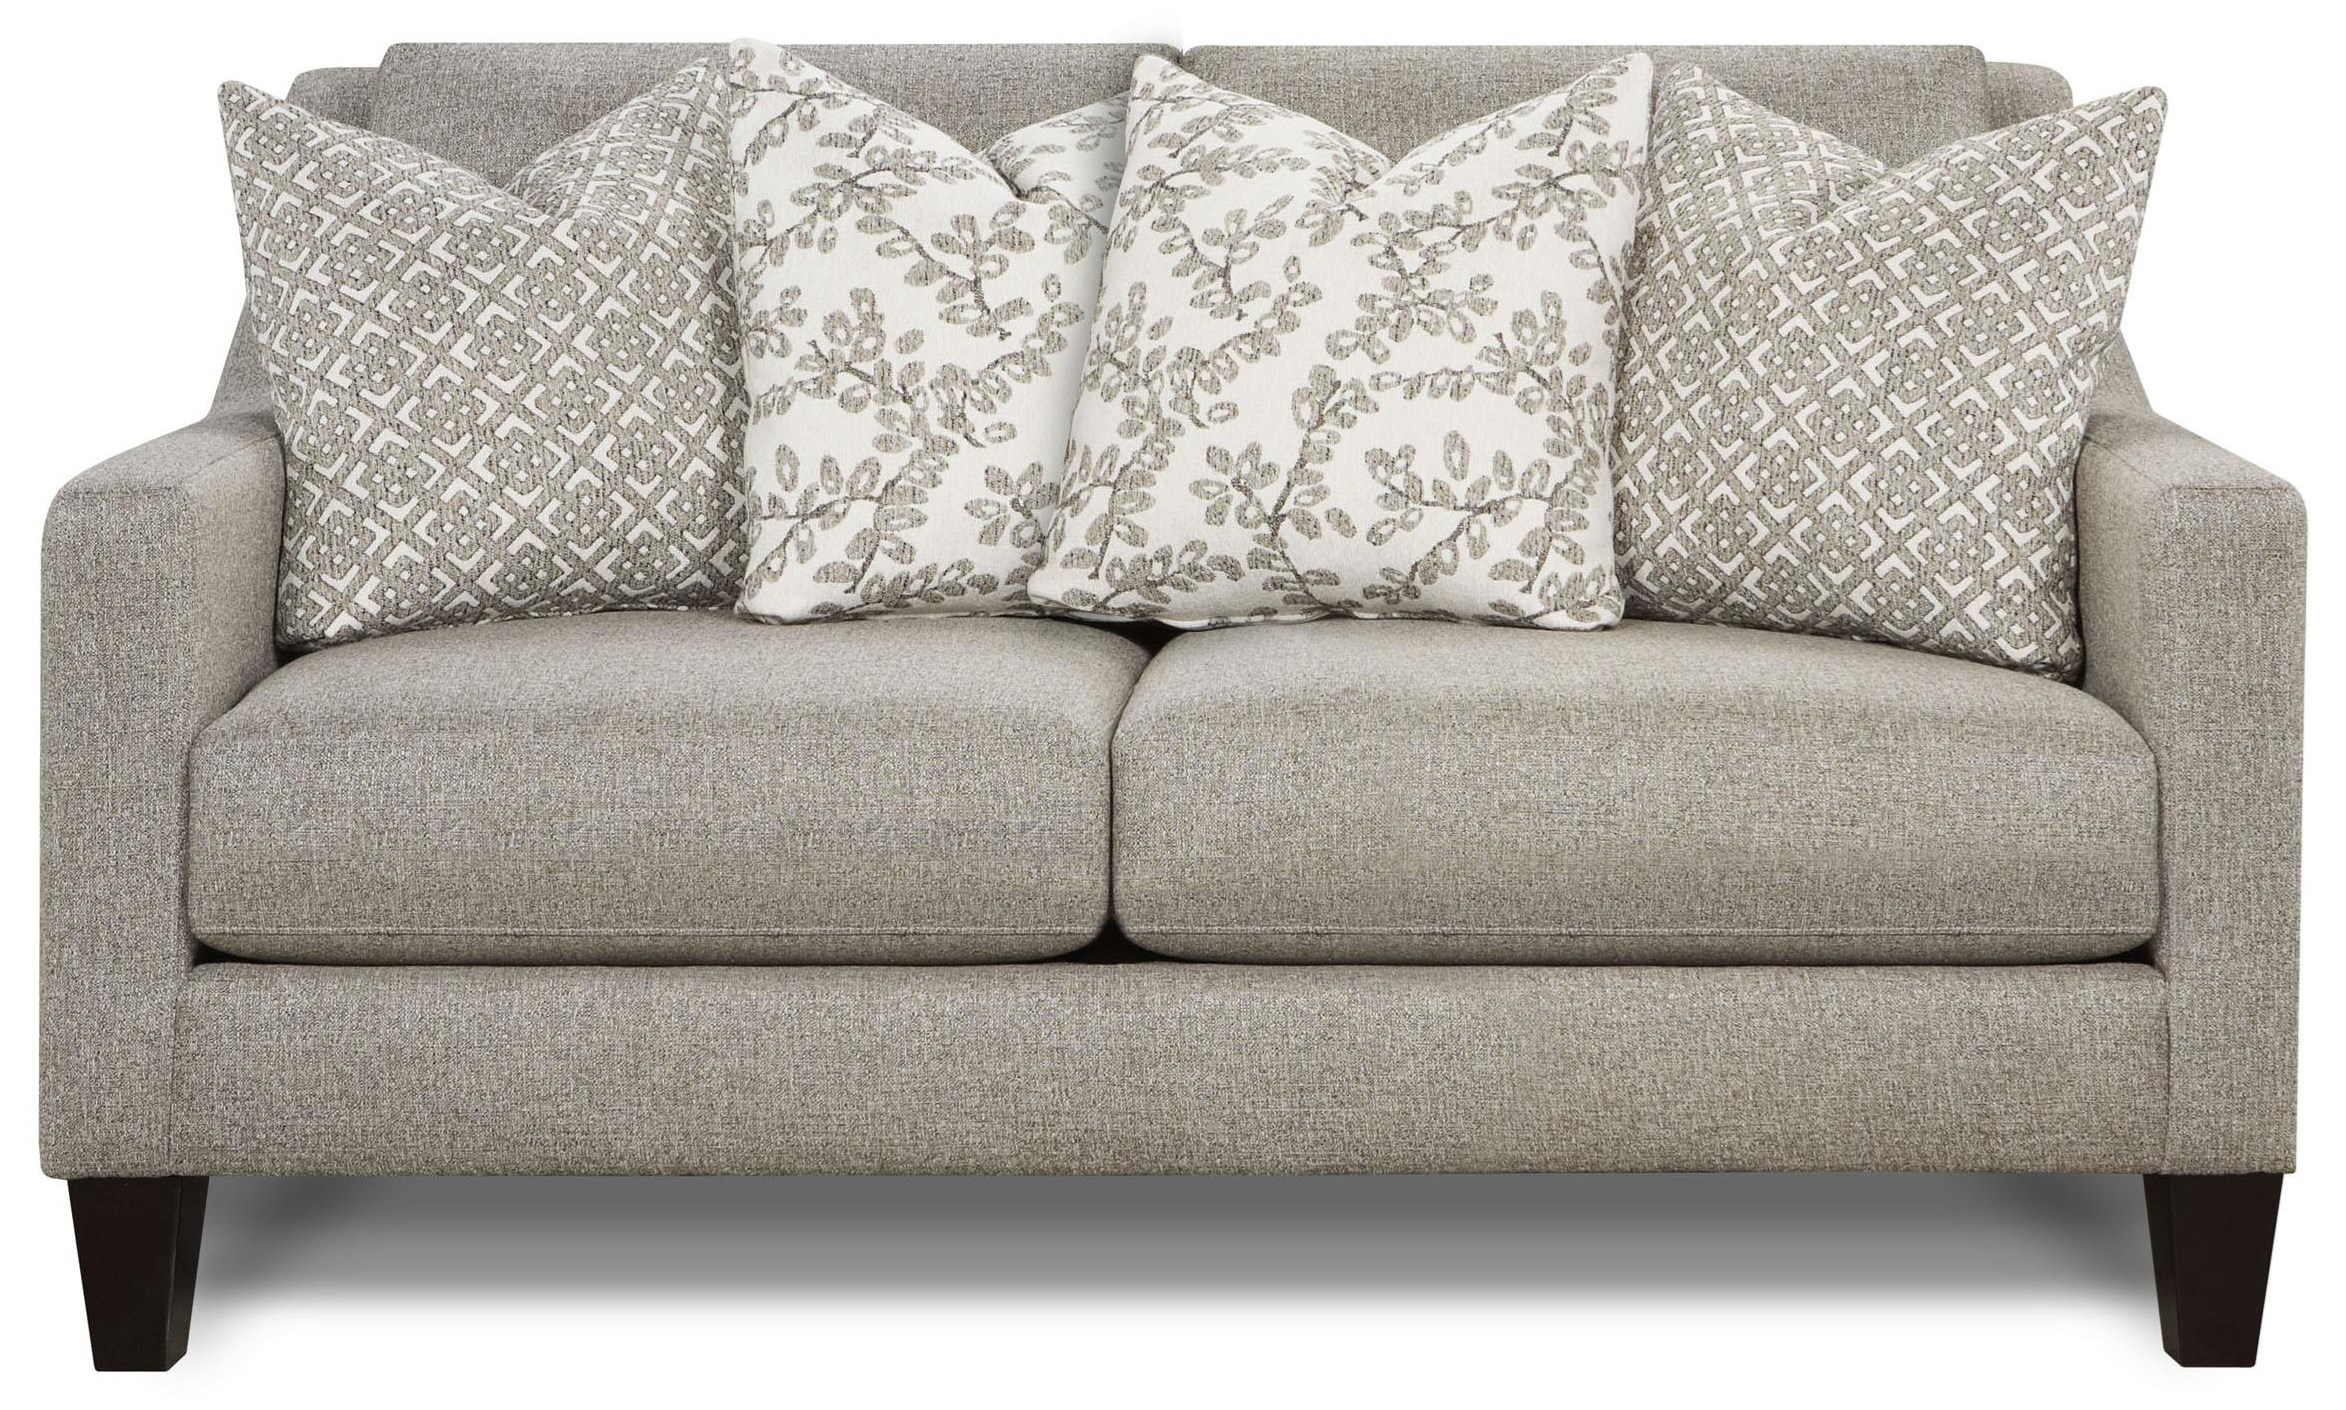 Fusion Furniture Isabella Loveseat - Item Number: 18328-L